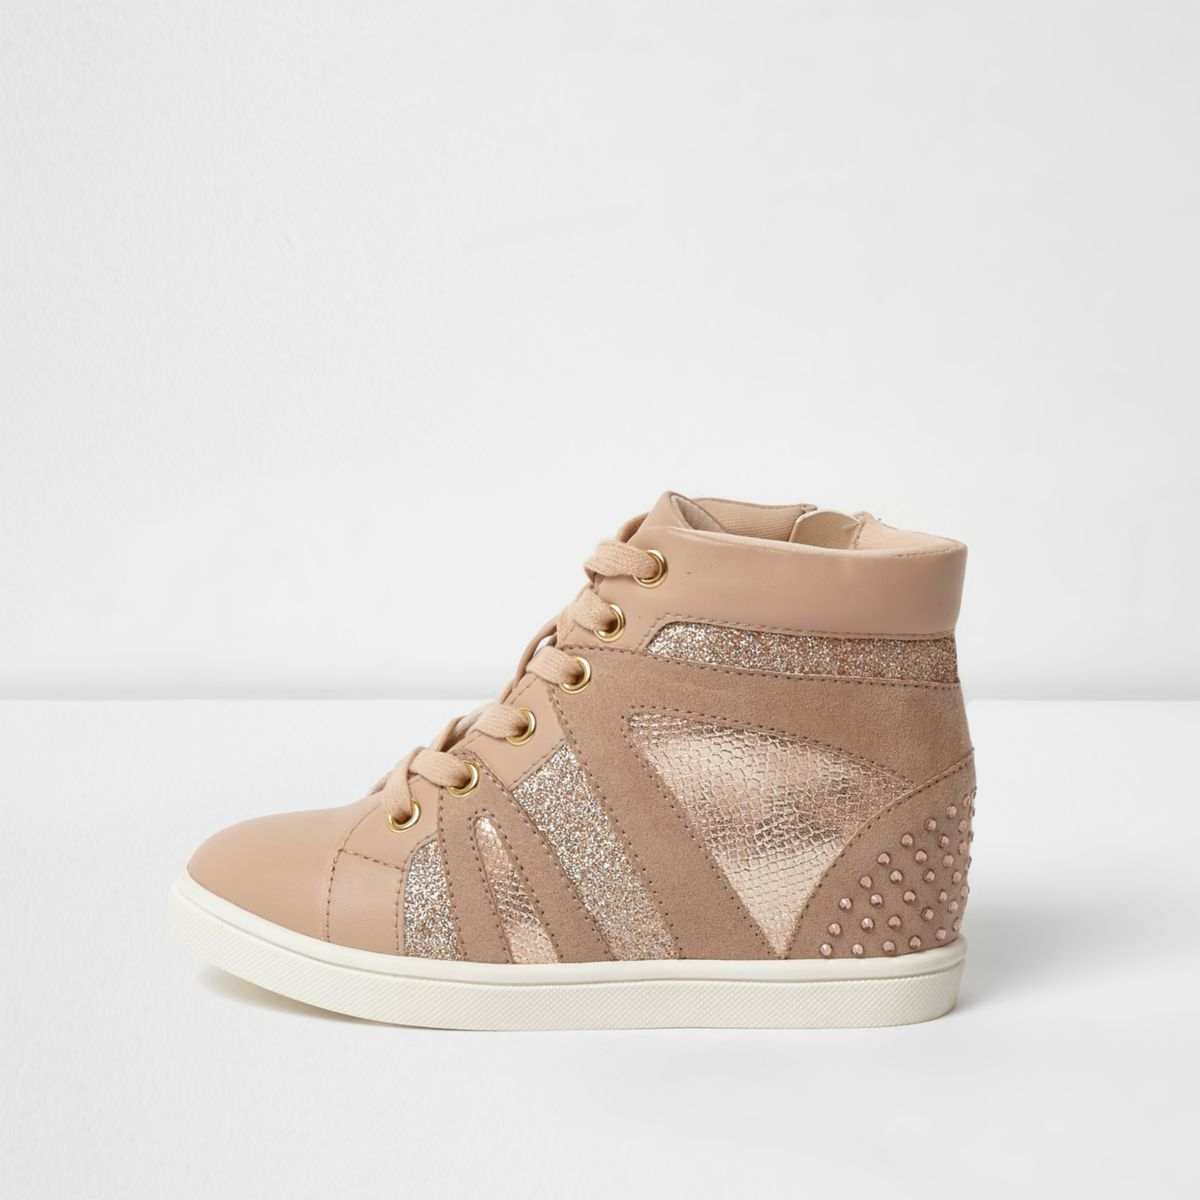 Pinke, glitzernde Sneakers mit Keilabsatz